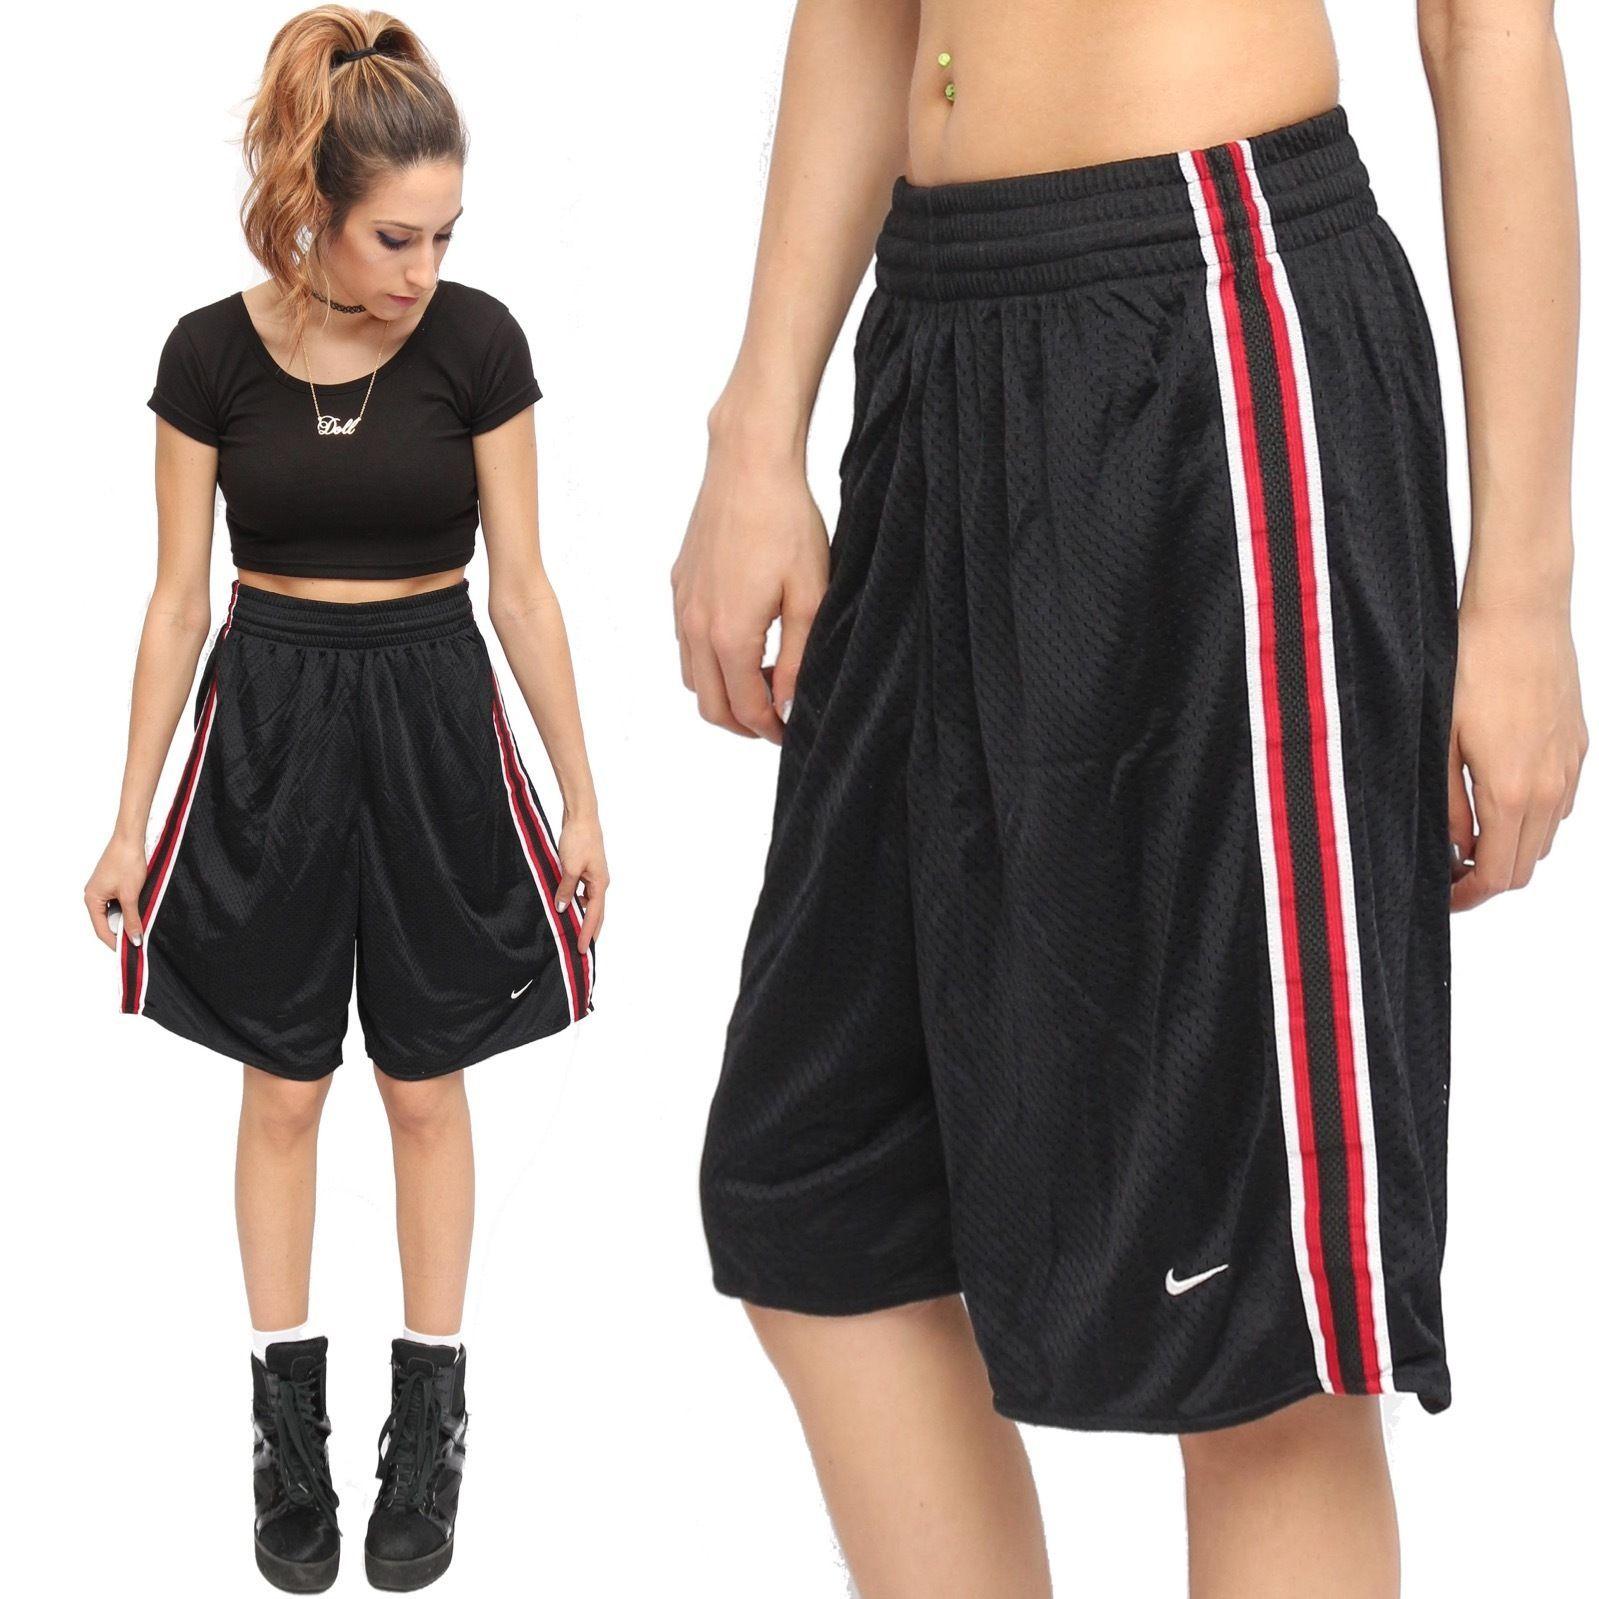 Nike Black Mesh Vintage 90 S Style Hip Hop Basketball Shorts W Red White Stripe Black Nikes Red And White Stripes Basketball Shorts